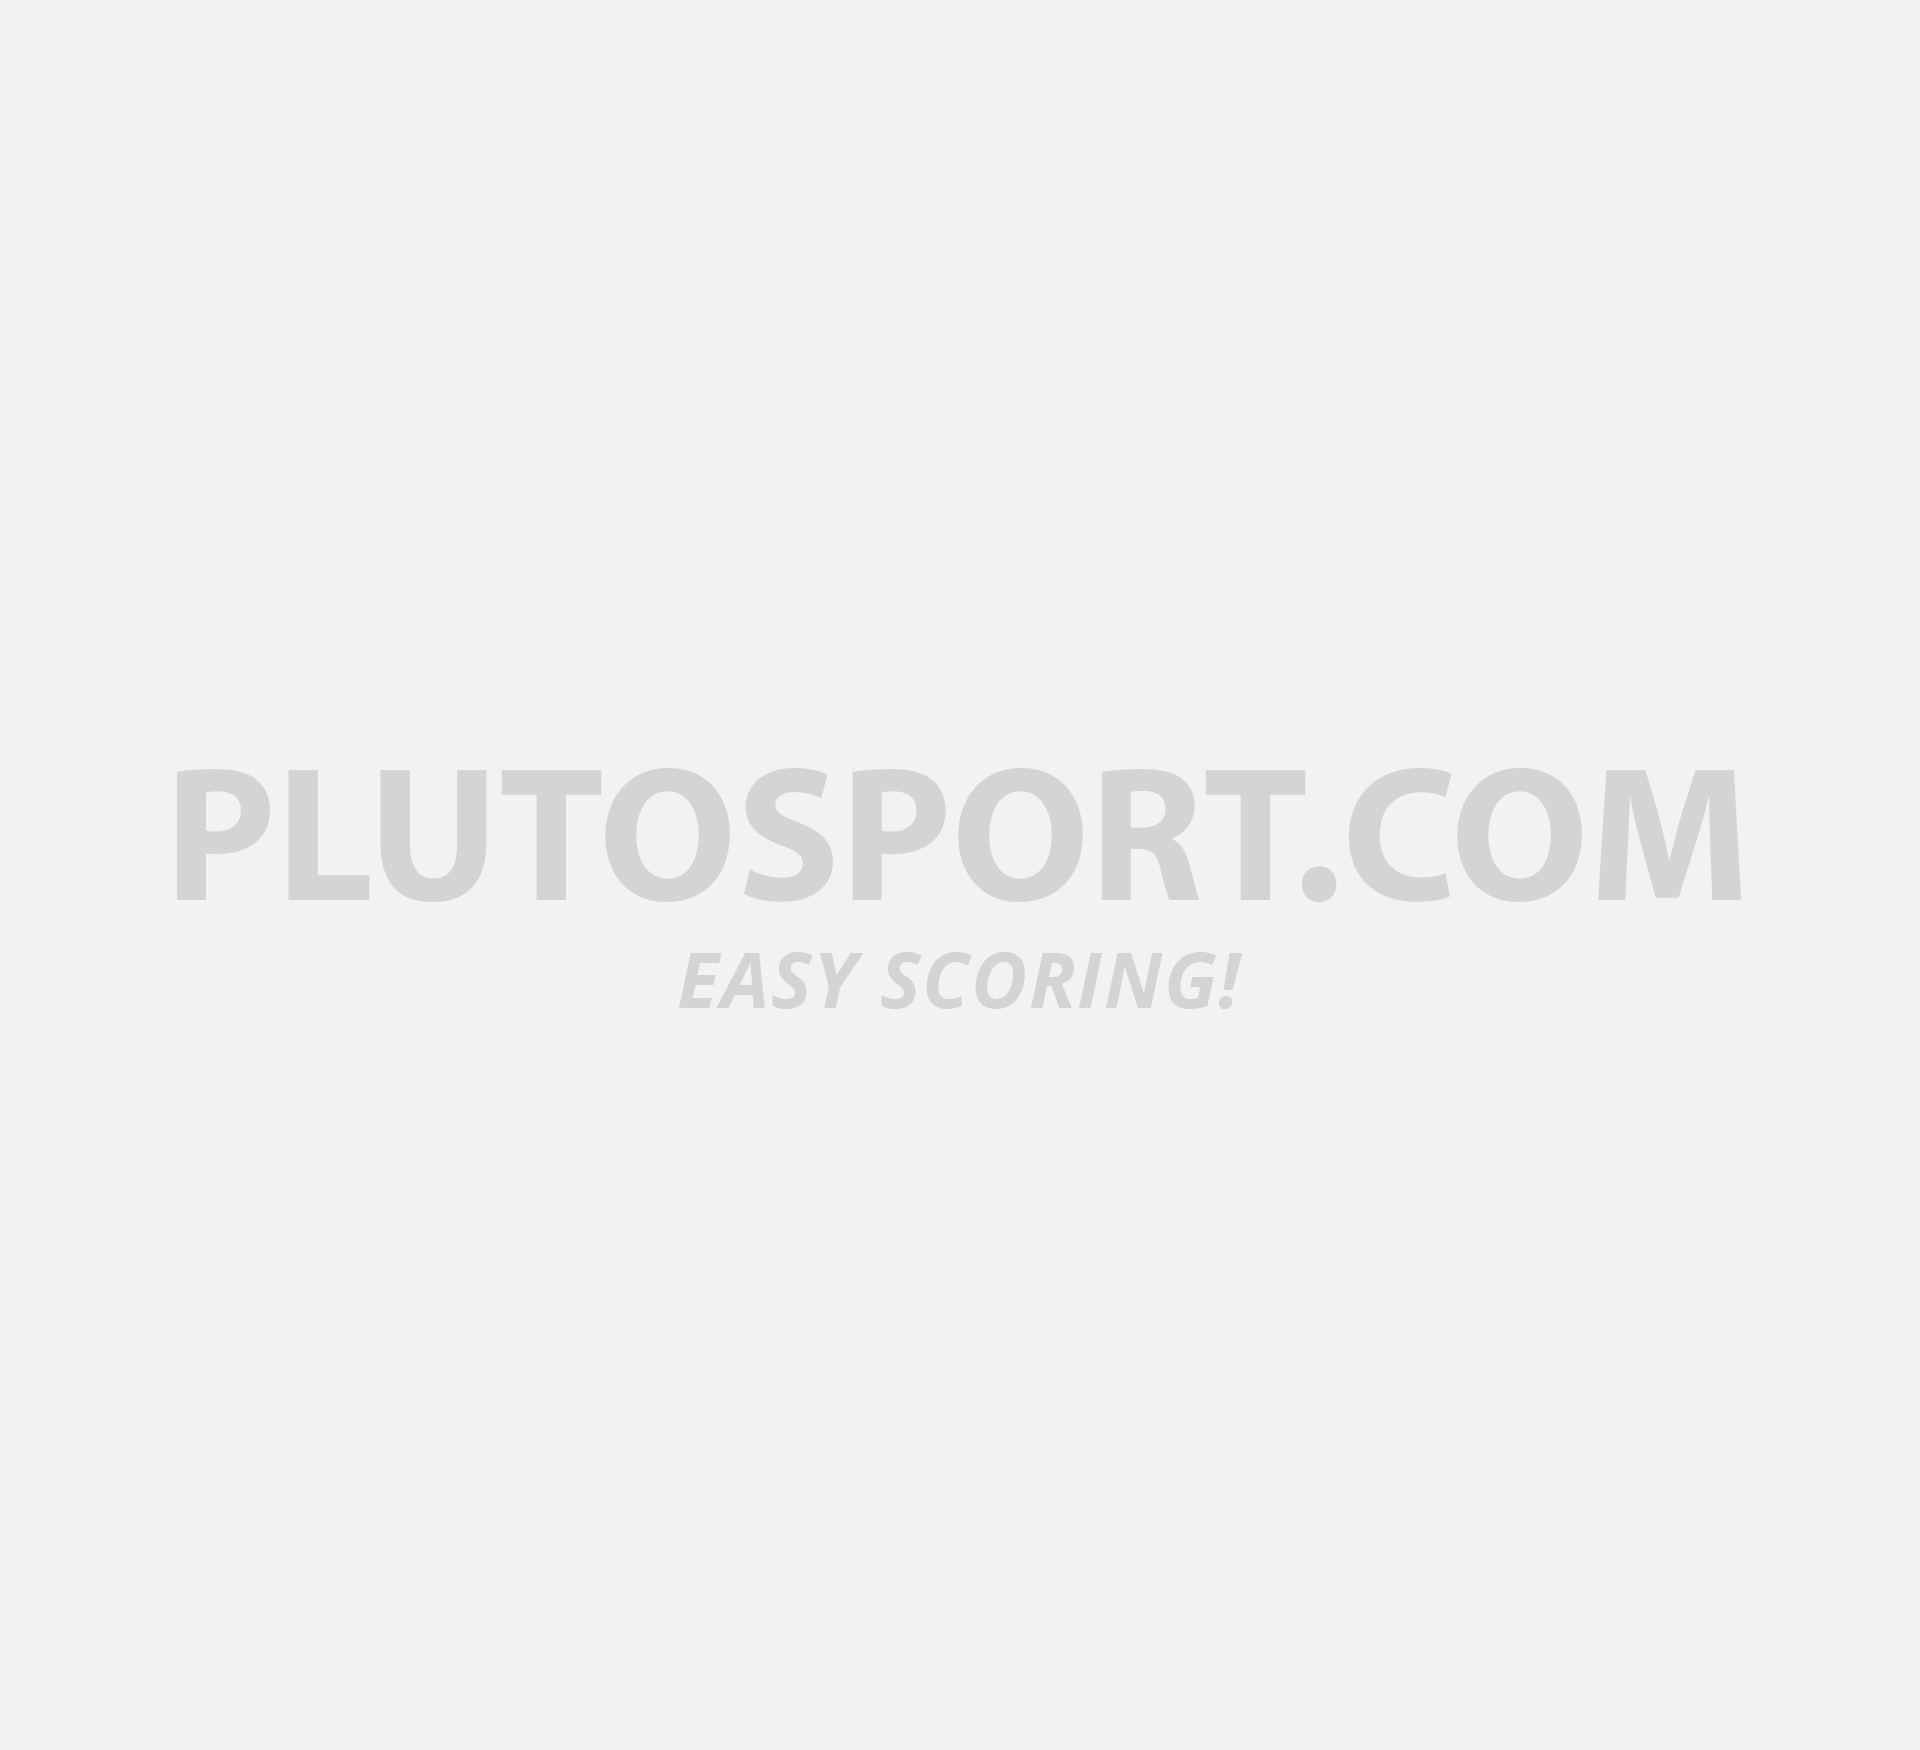 Nike NPC Core Compression Top Women s - Shirts - Compression clothing -  Clothing - Football - Sports  eda3a49123